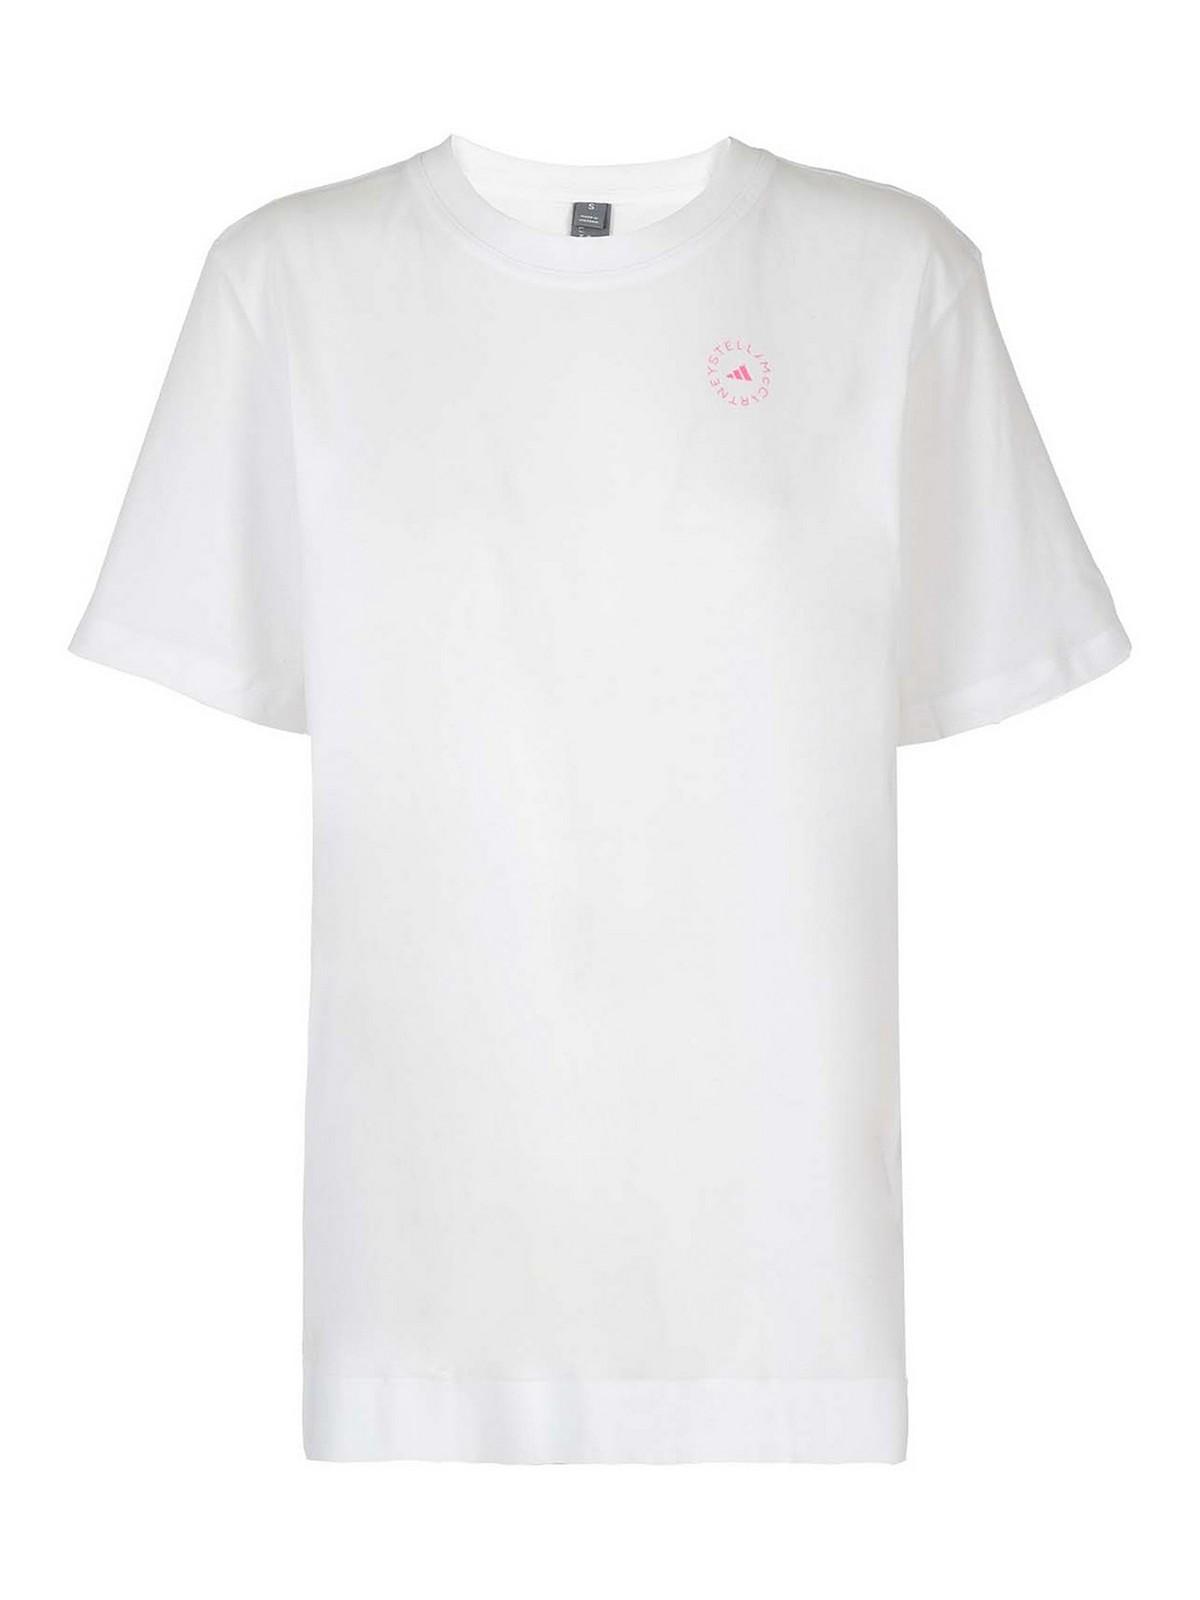 Adidas By Stella Mccartney T-shirts LOGO PRINT COTTON T-SHIRT